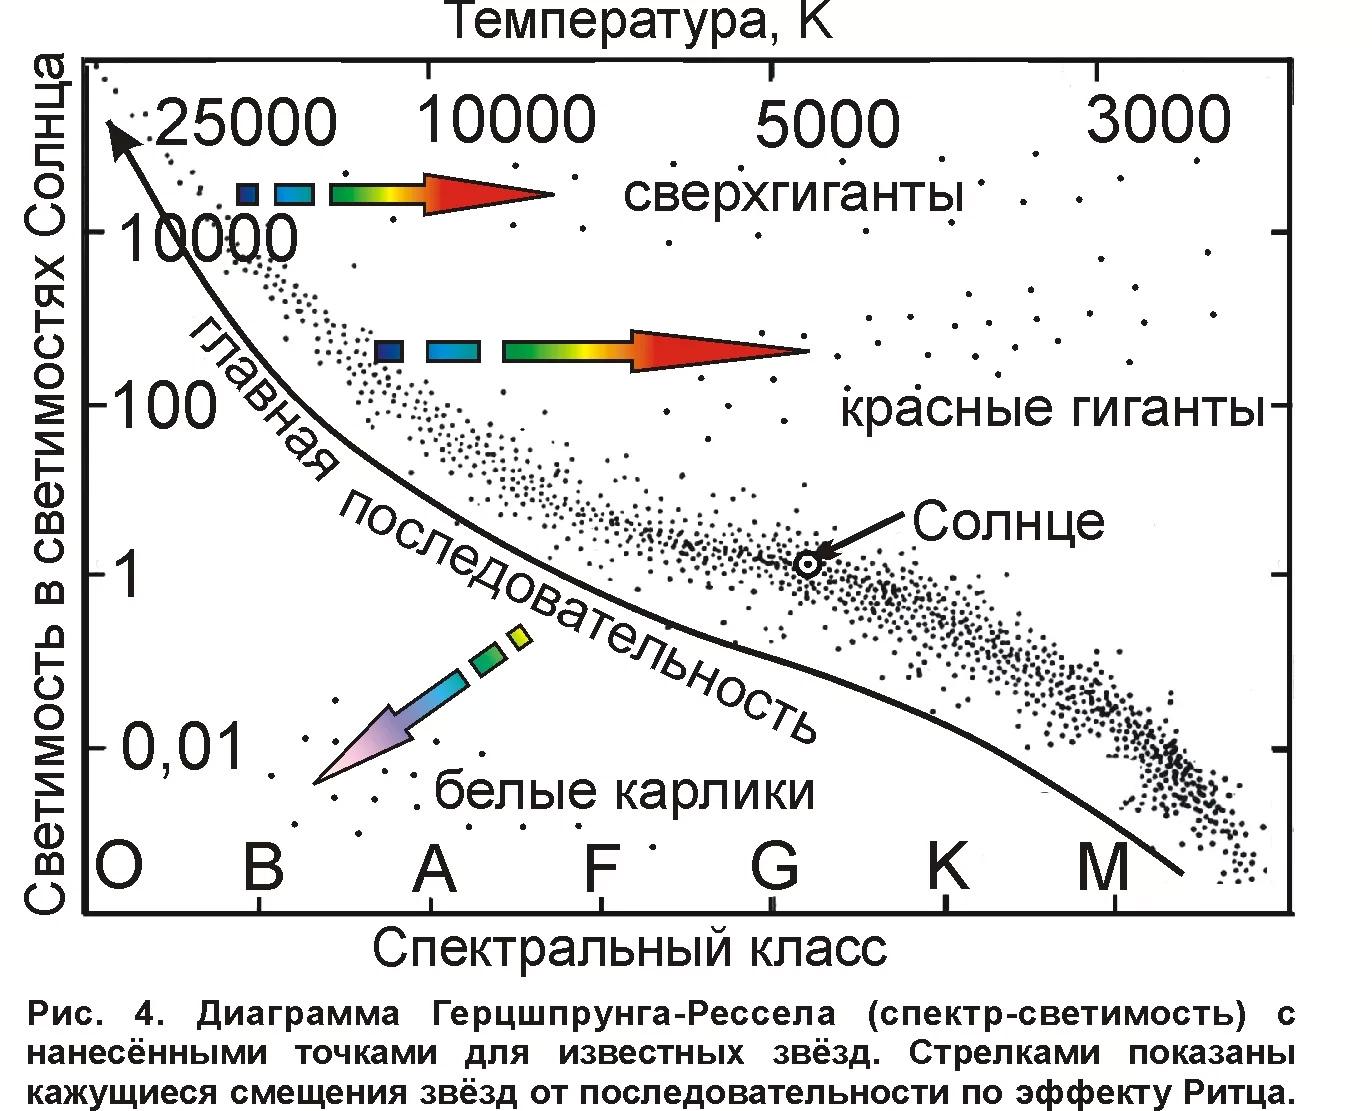 Диаграмма Герцшпрунга — Рессела: Шкала эволюции звезд